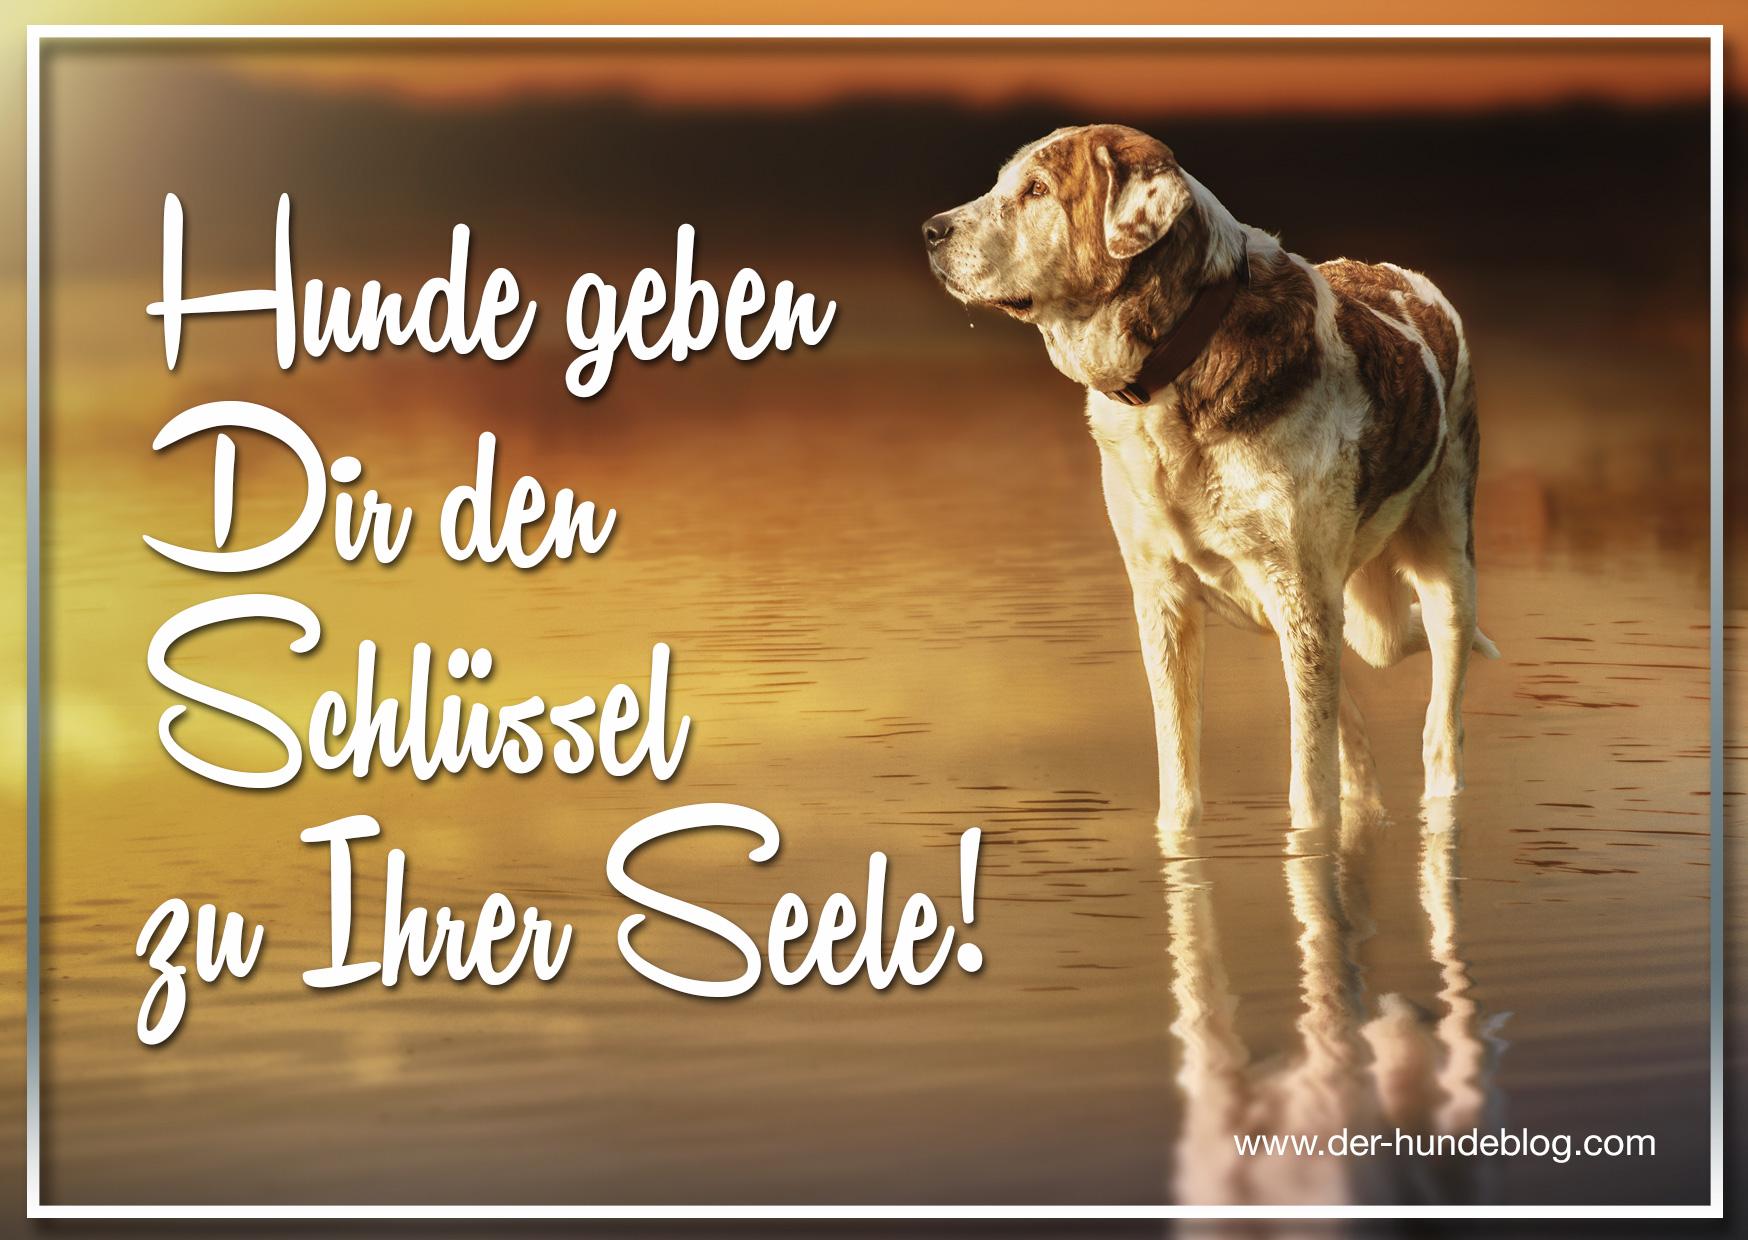 der-hundeblog-schoene-sprueche-hunde-9